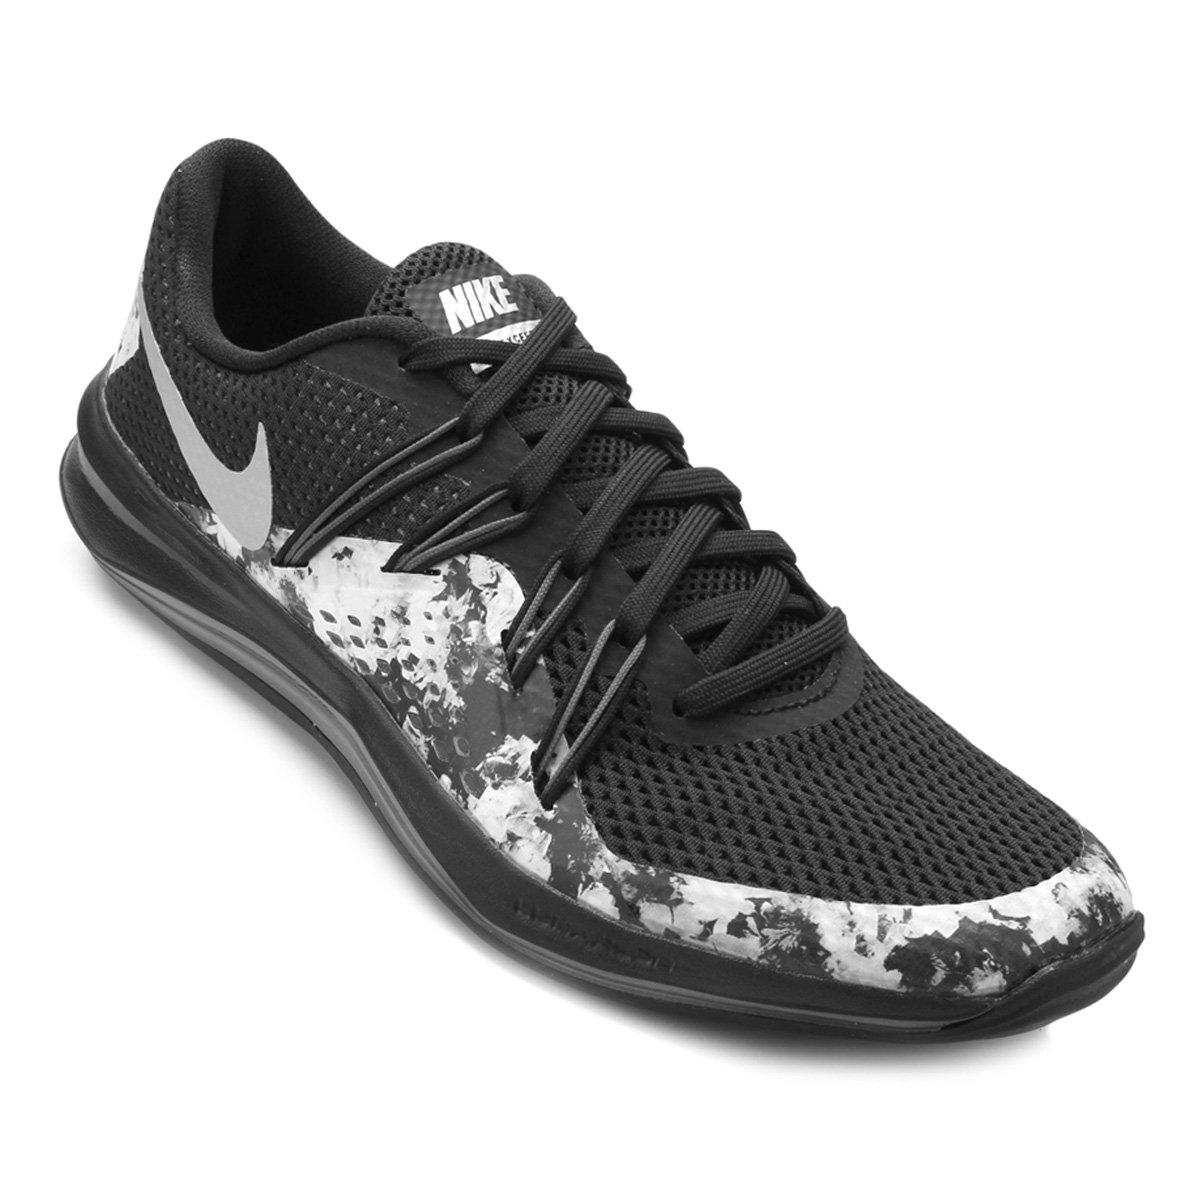 Tênis Nike Lunar Exceed Tr Print Feminino Preto e Prata